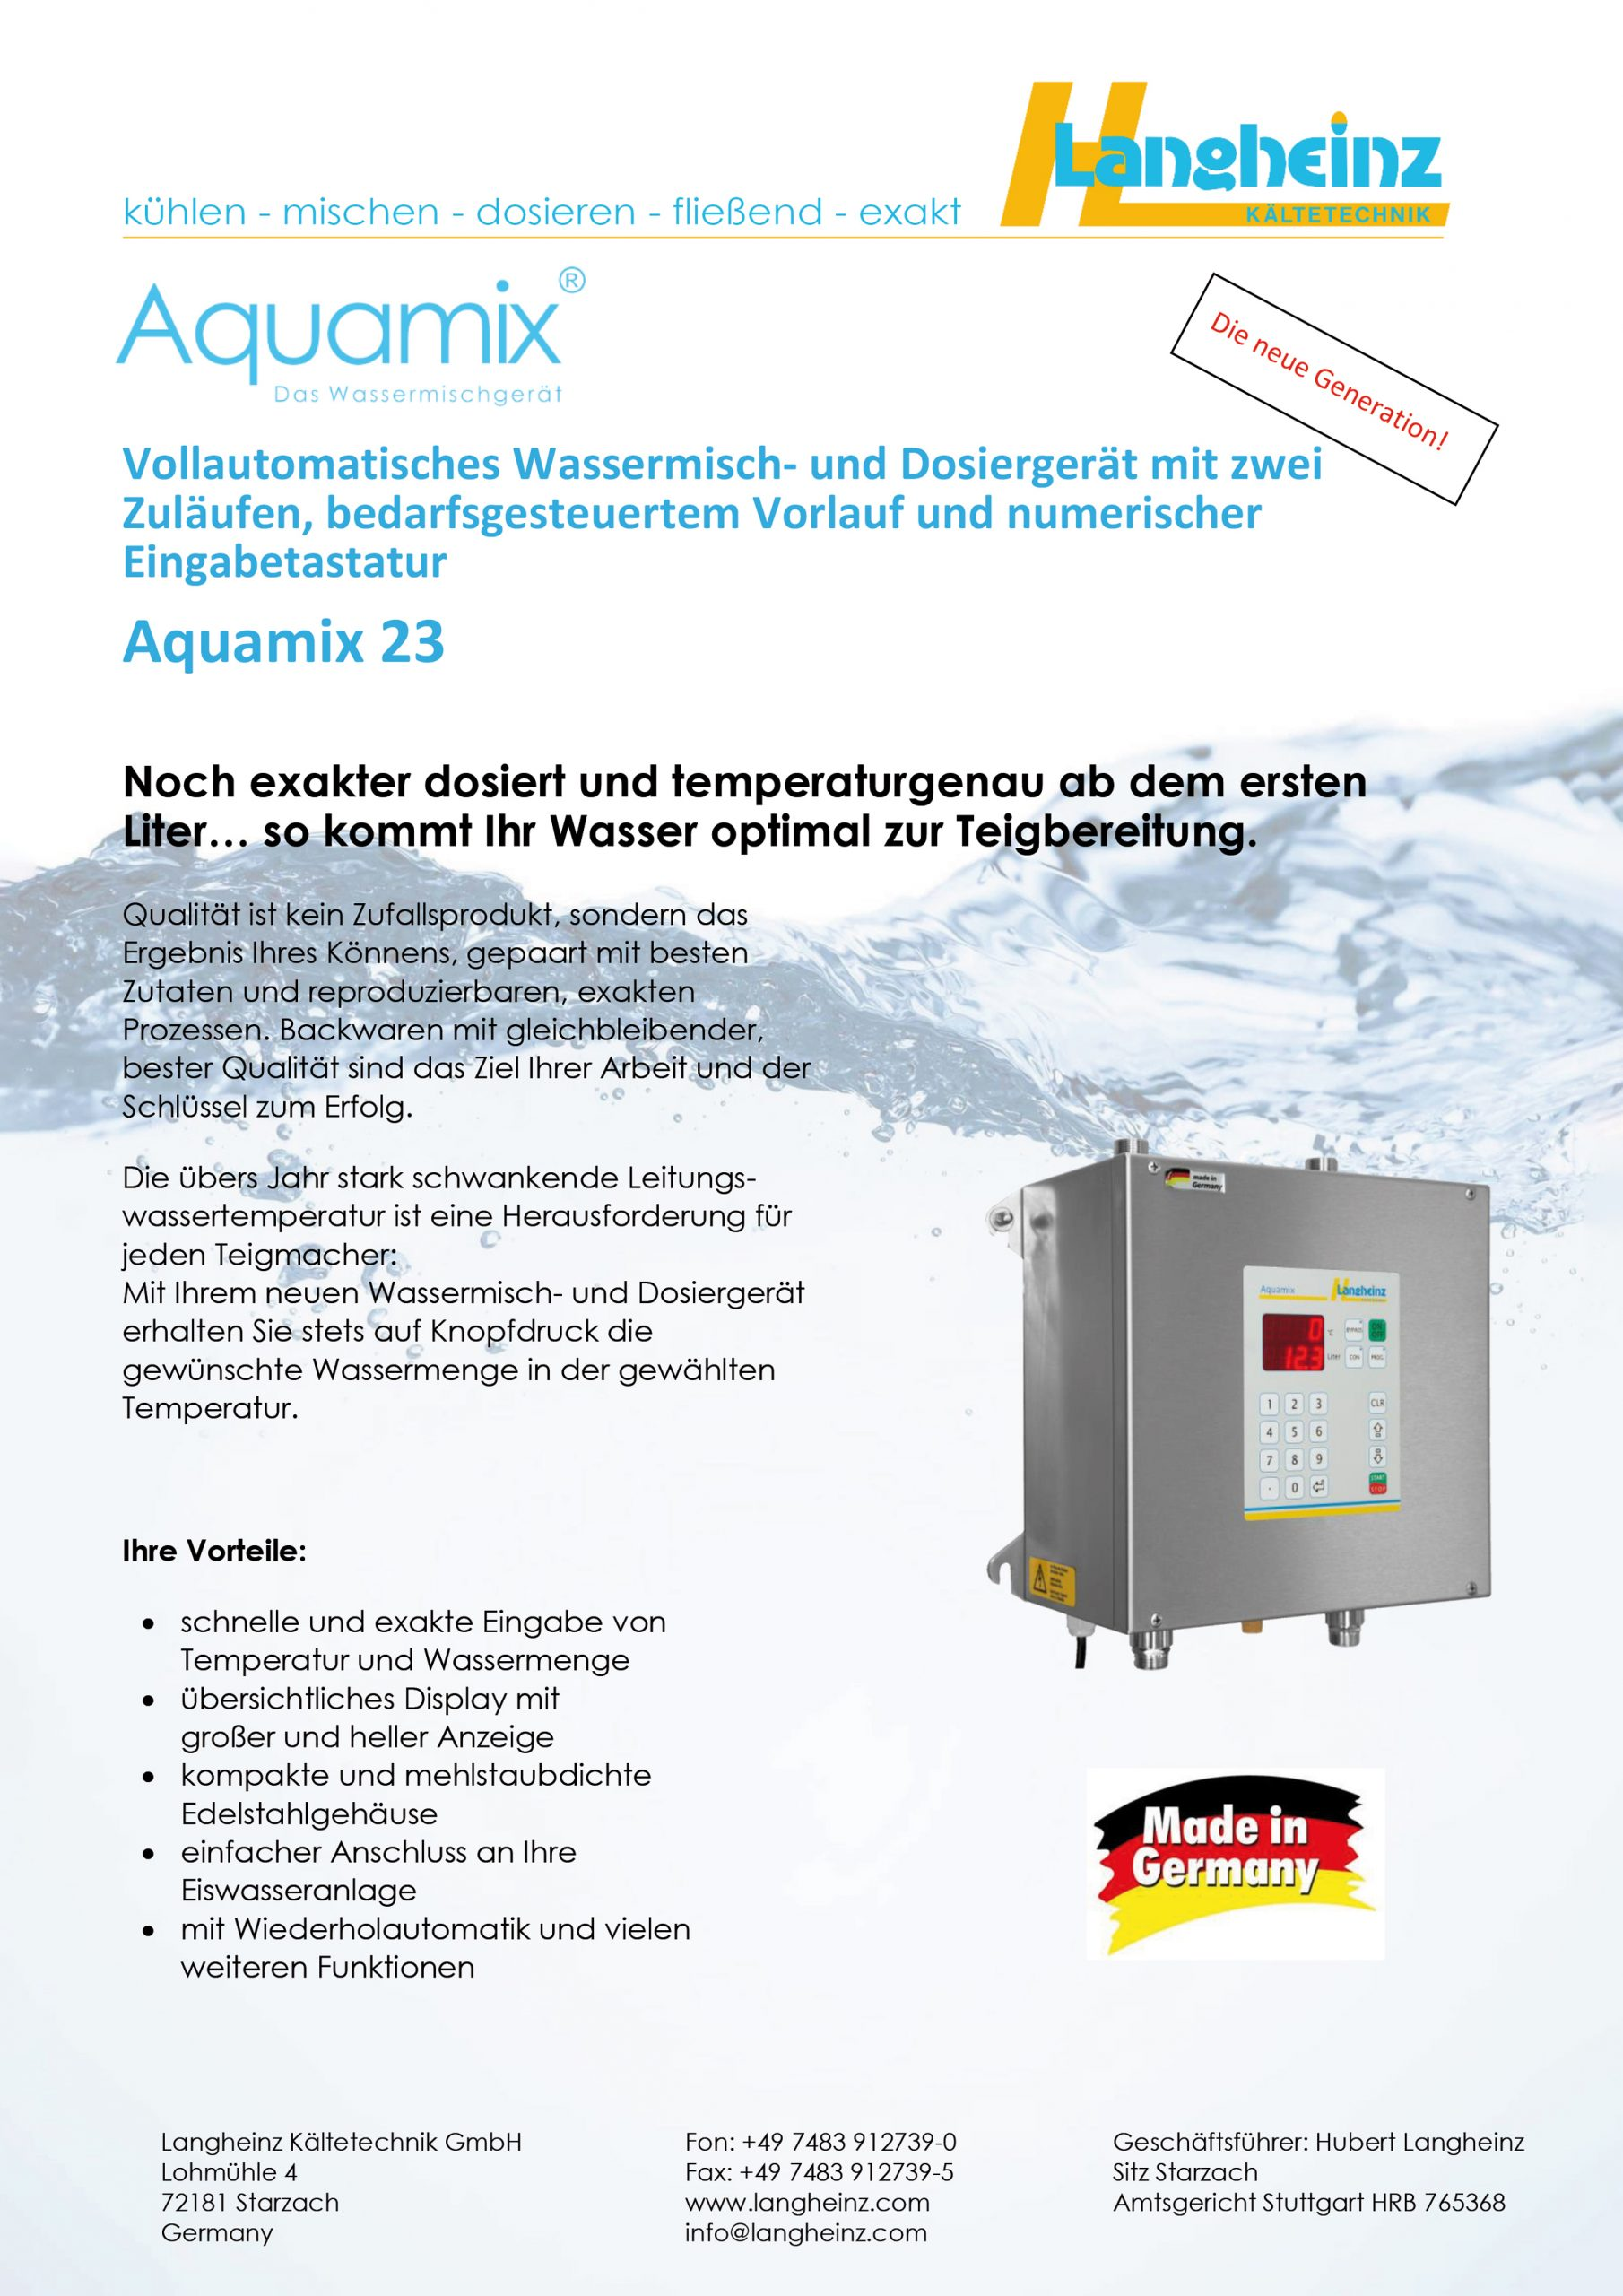 Datenblatt Aquamix 23 (Preview)